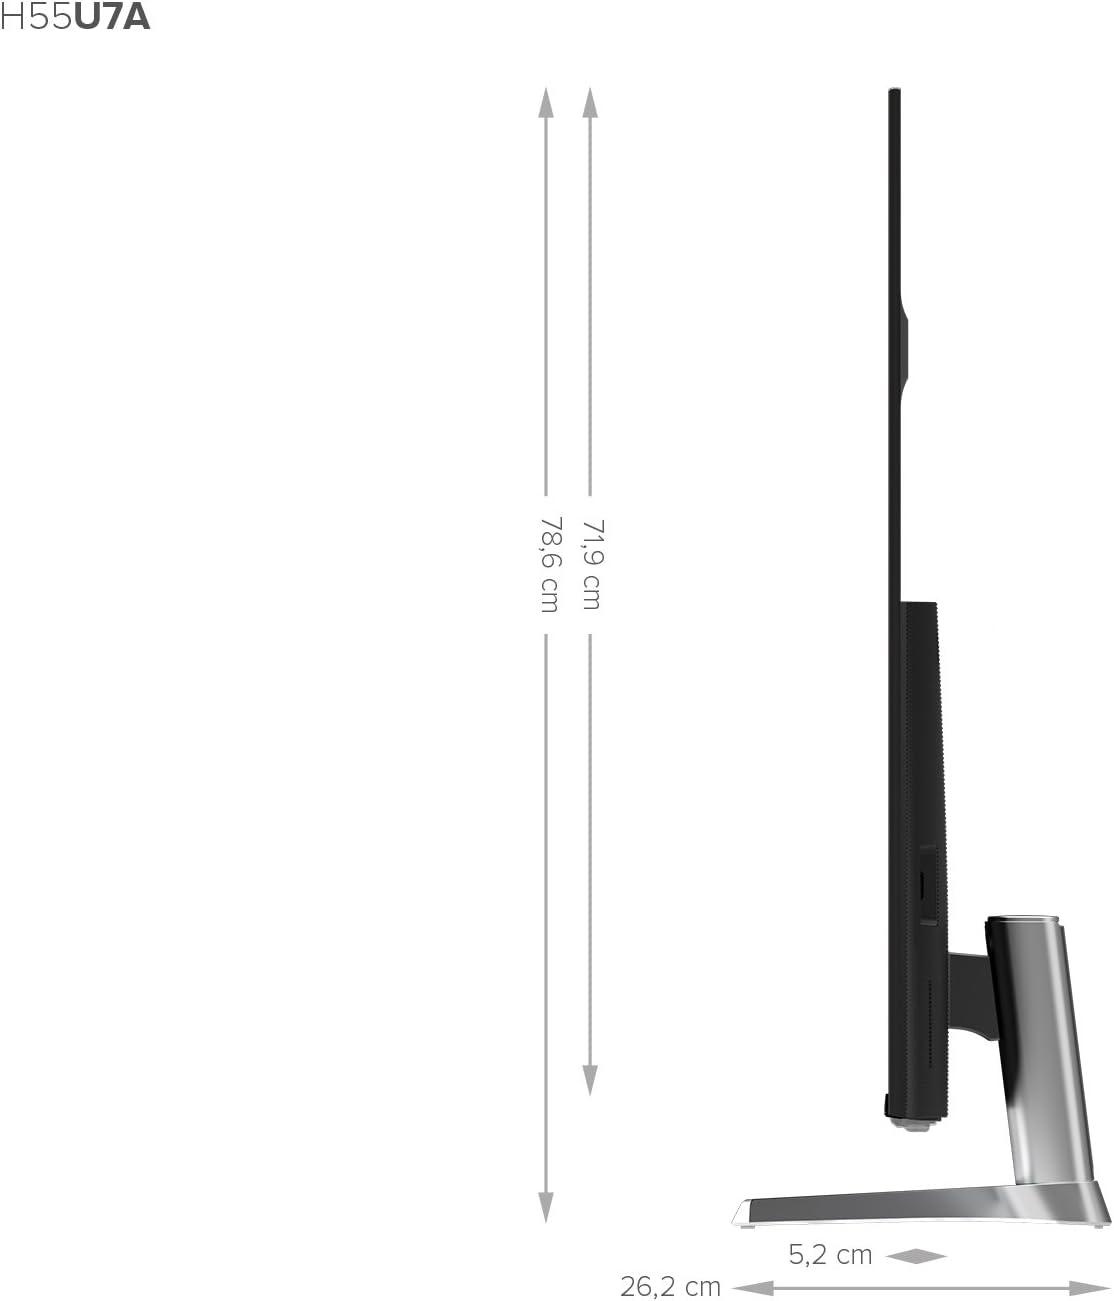 Modo Deportes HDR Perfect 8,9 mm Hisense H50U7A Grosor ultrafino Dise/ño met/álico sin marcos TV Hisense 50 ULED 4K Ultra HD Local Dimming Smart TV VIDAA U